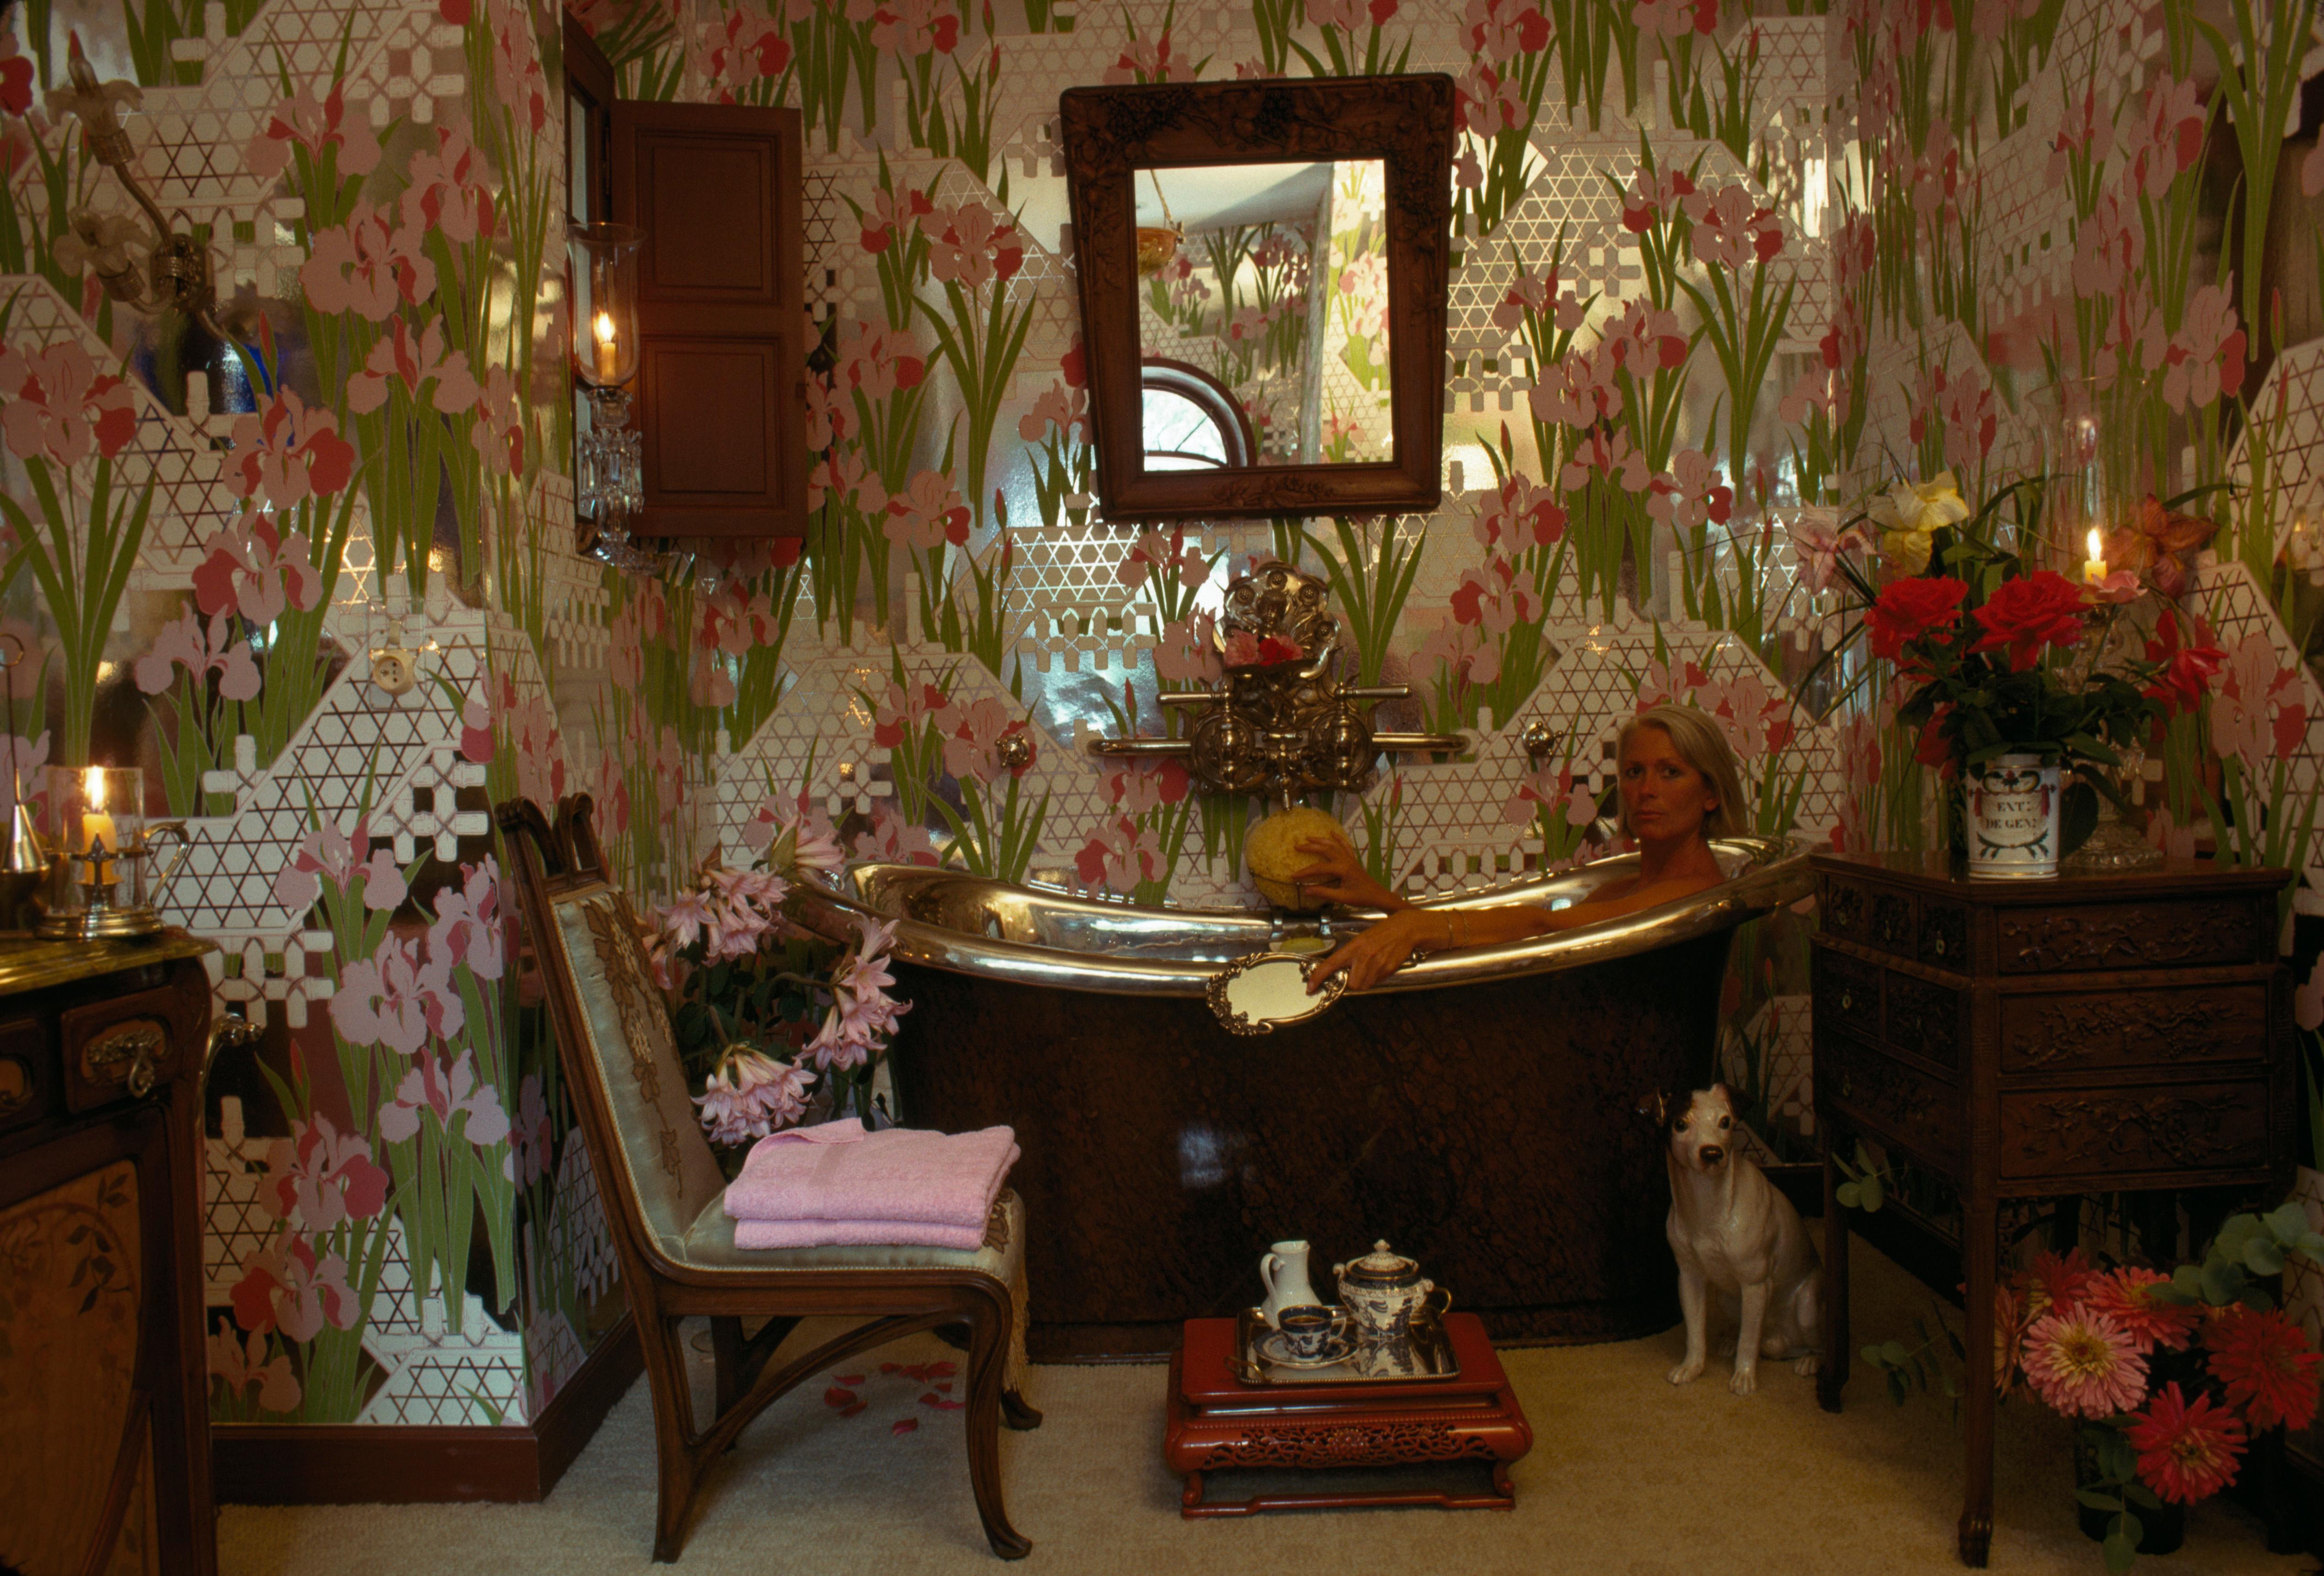 Slim Aarons, 'French Bath' (Slim Aarons Estate Edition)